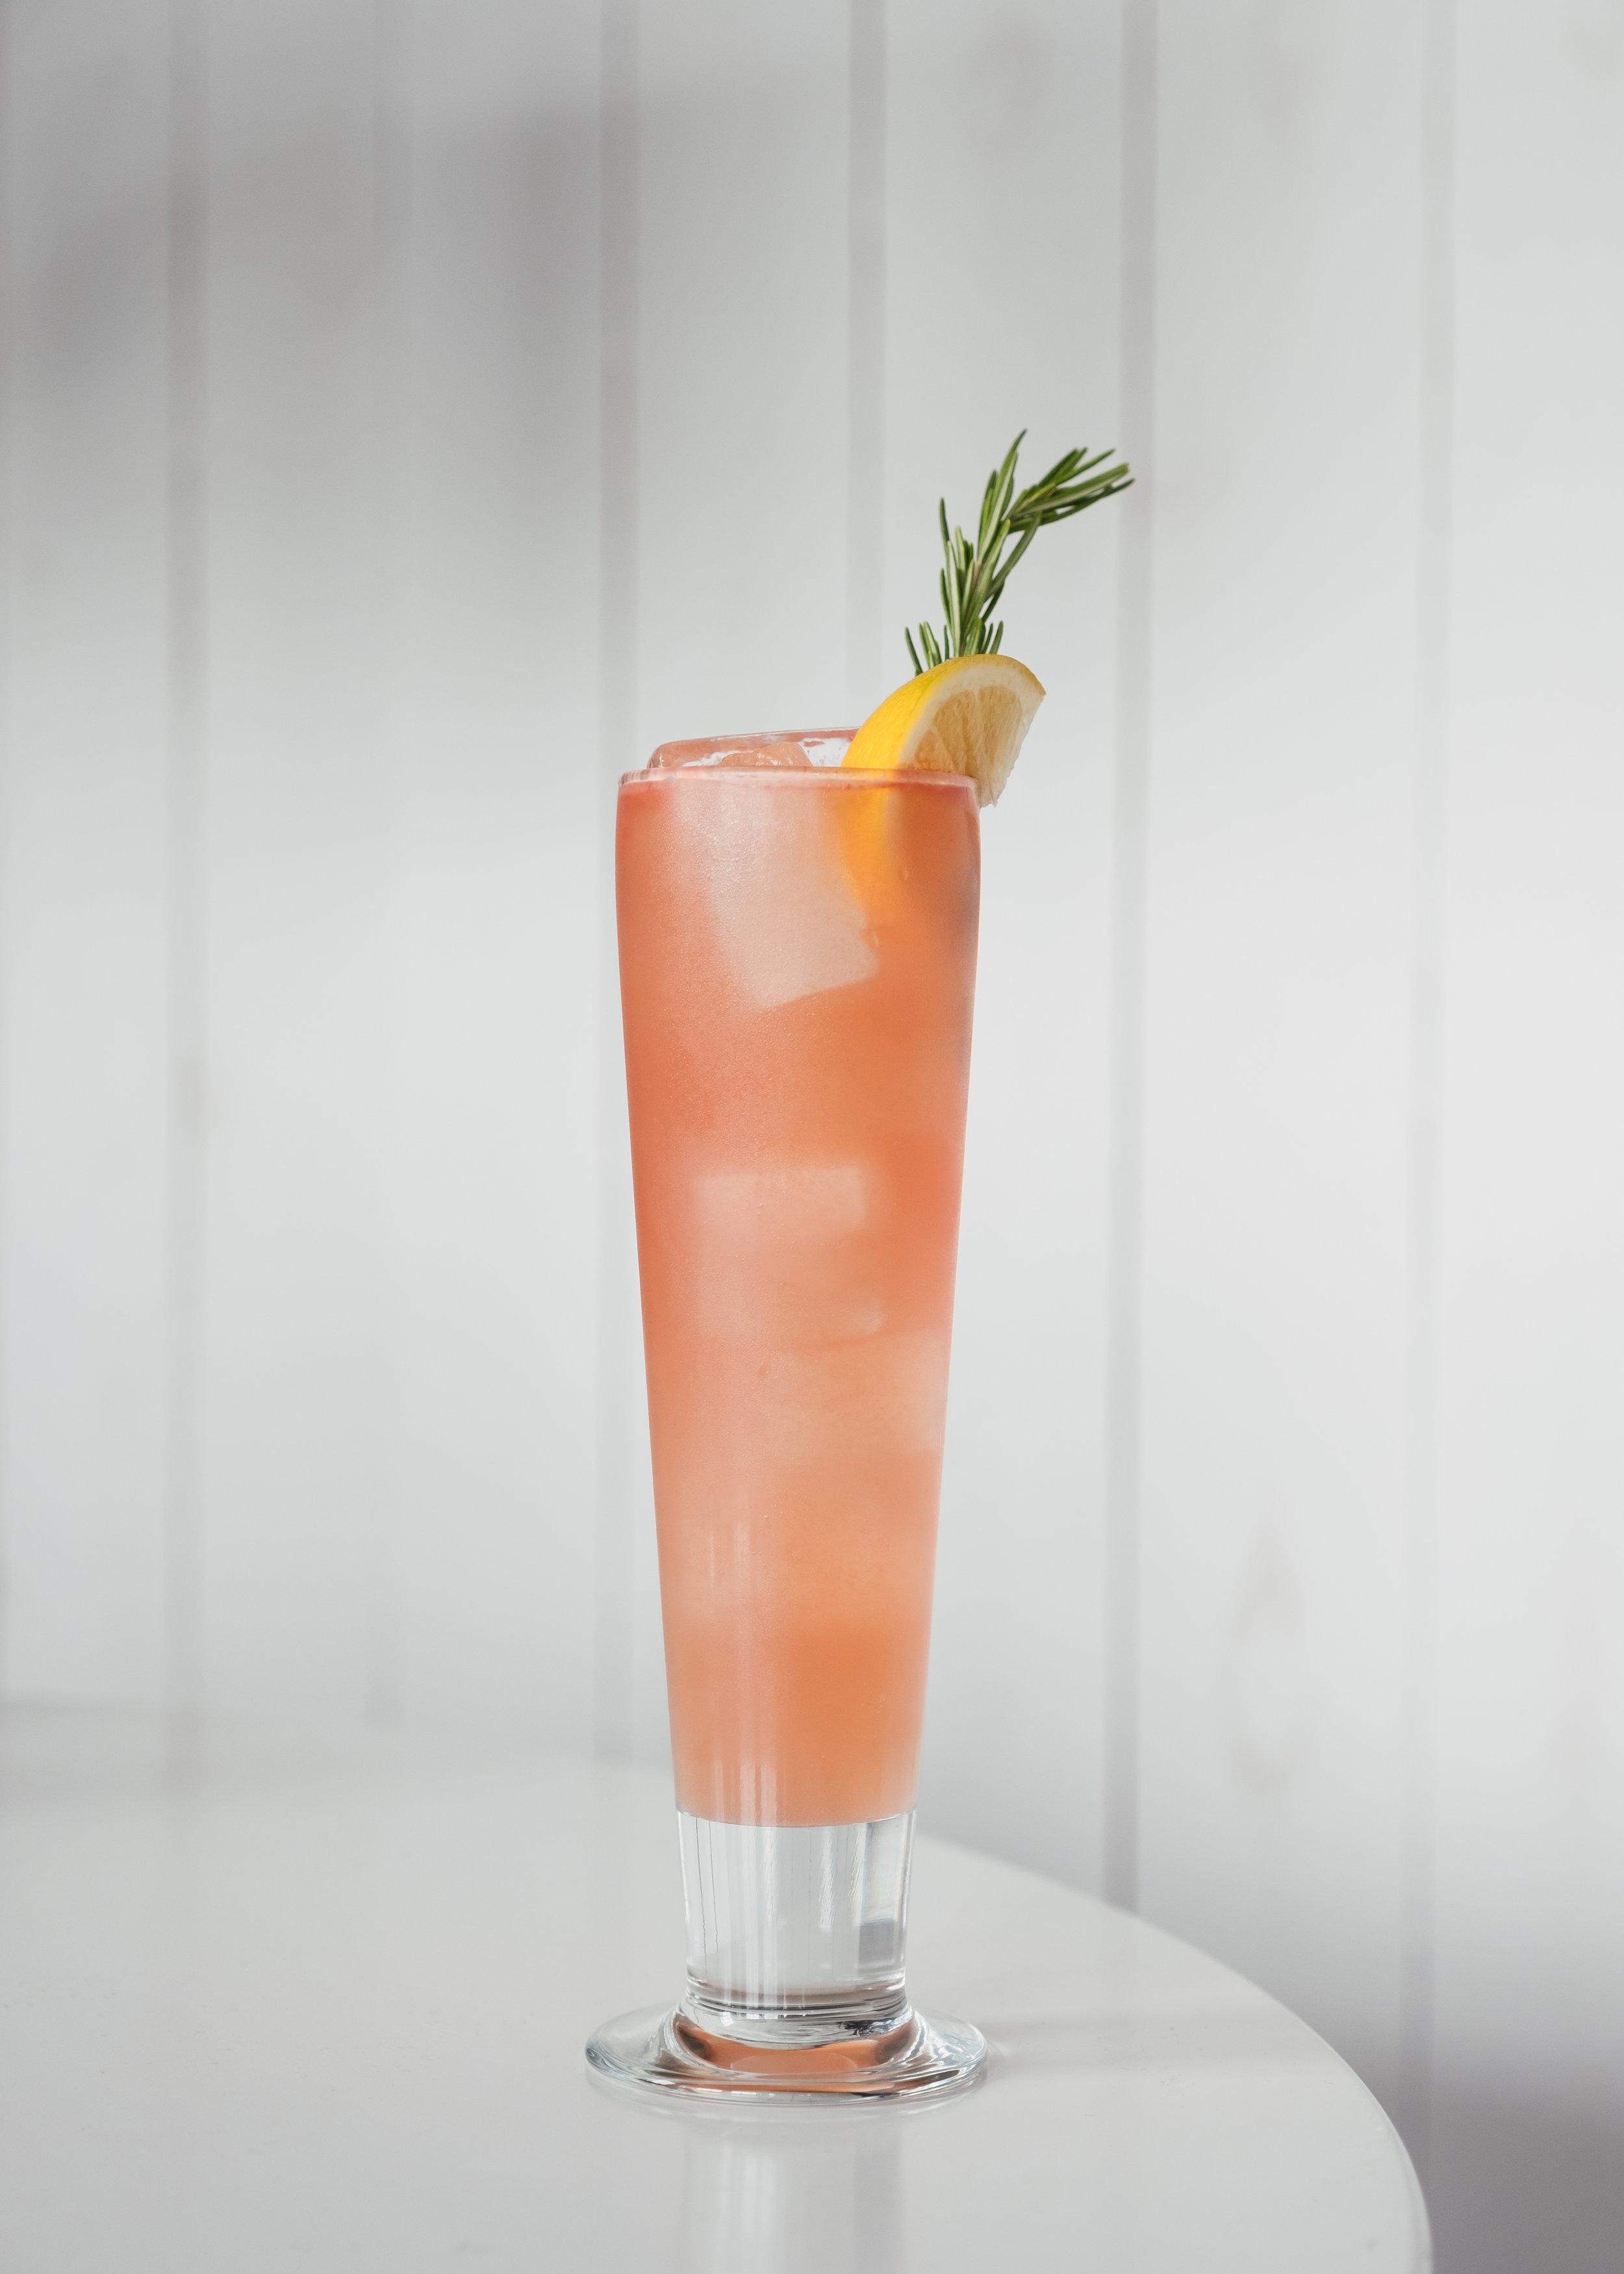 ingredients - 2 oz Citrus-forward gin¾ oz ginger liqueur1 oz fresh lemon juice½ oz *Rosemary simple syrup3-4 one-inch cubes of watermelonDry lemon soda